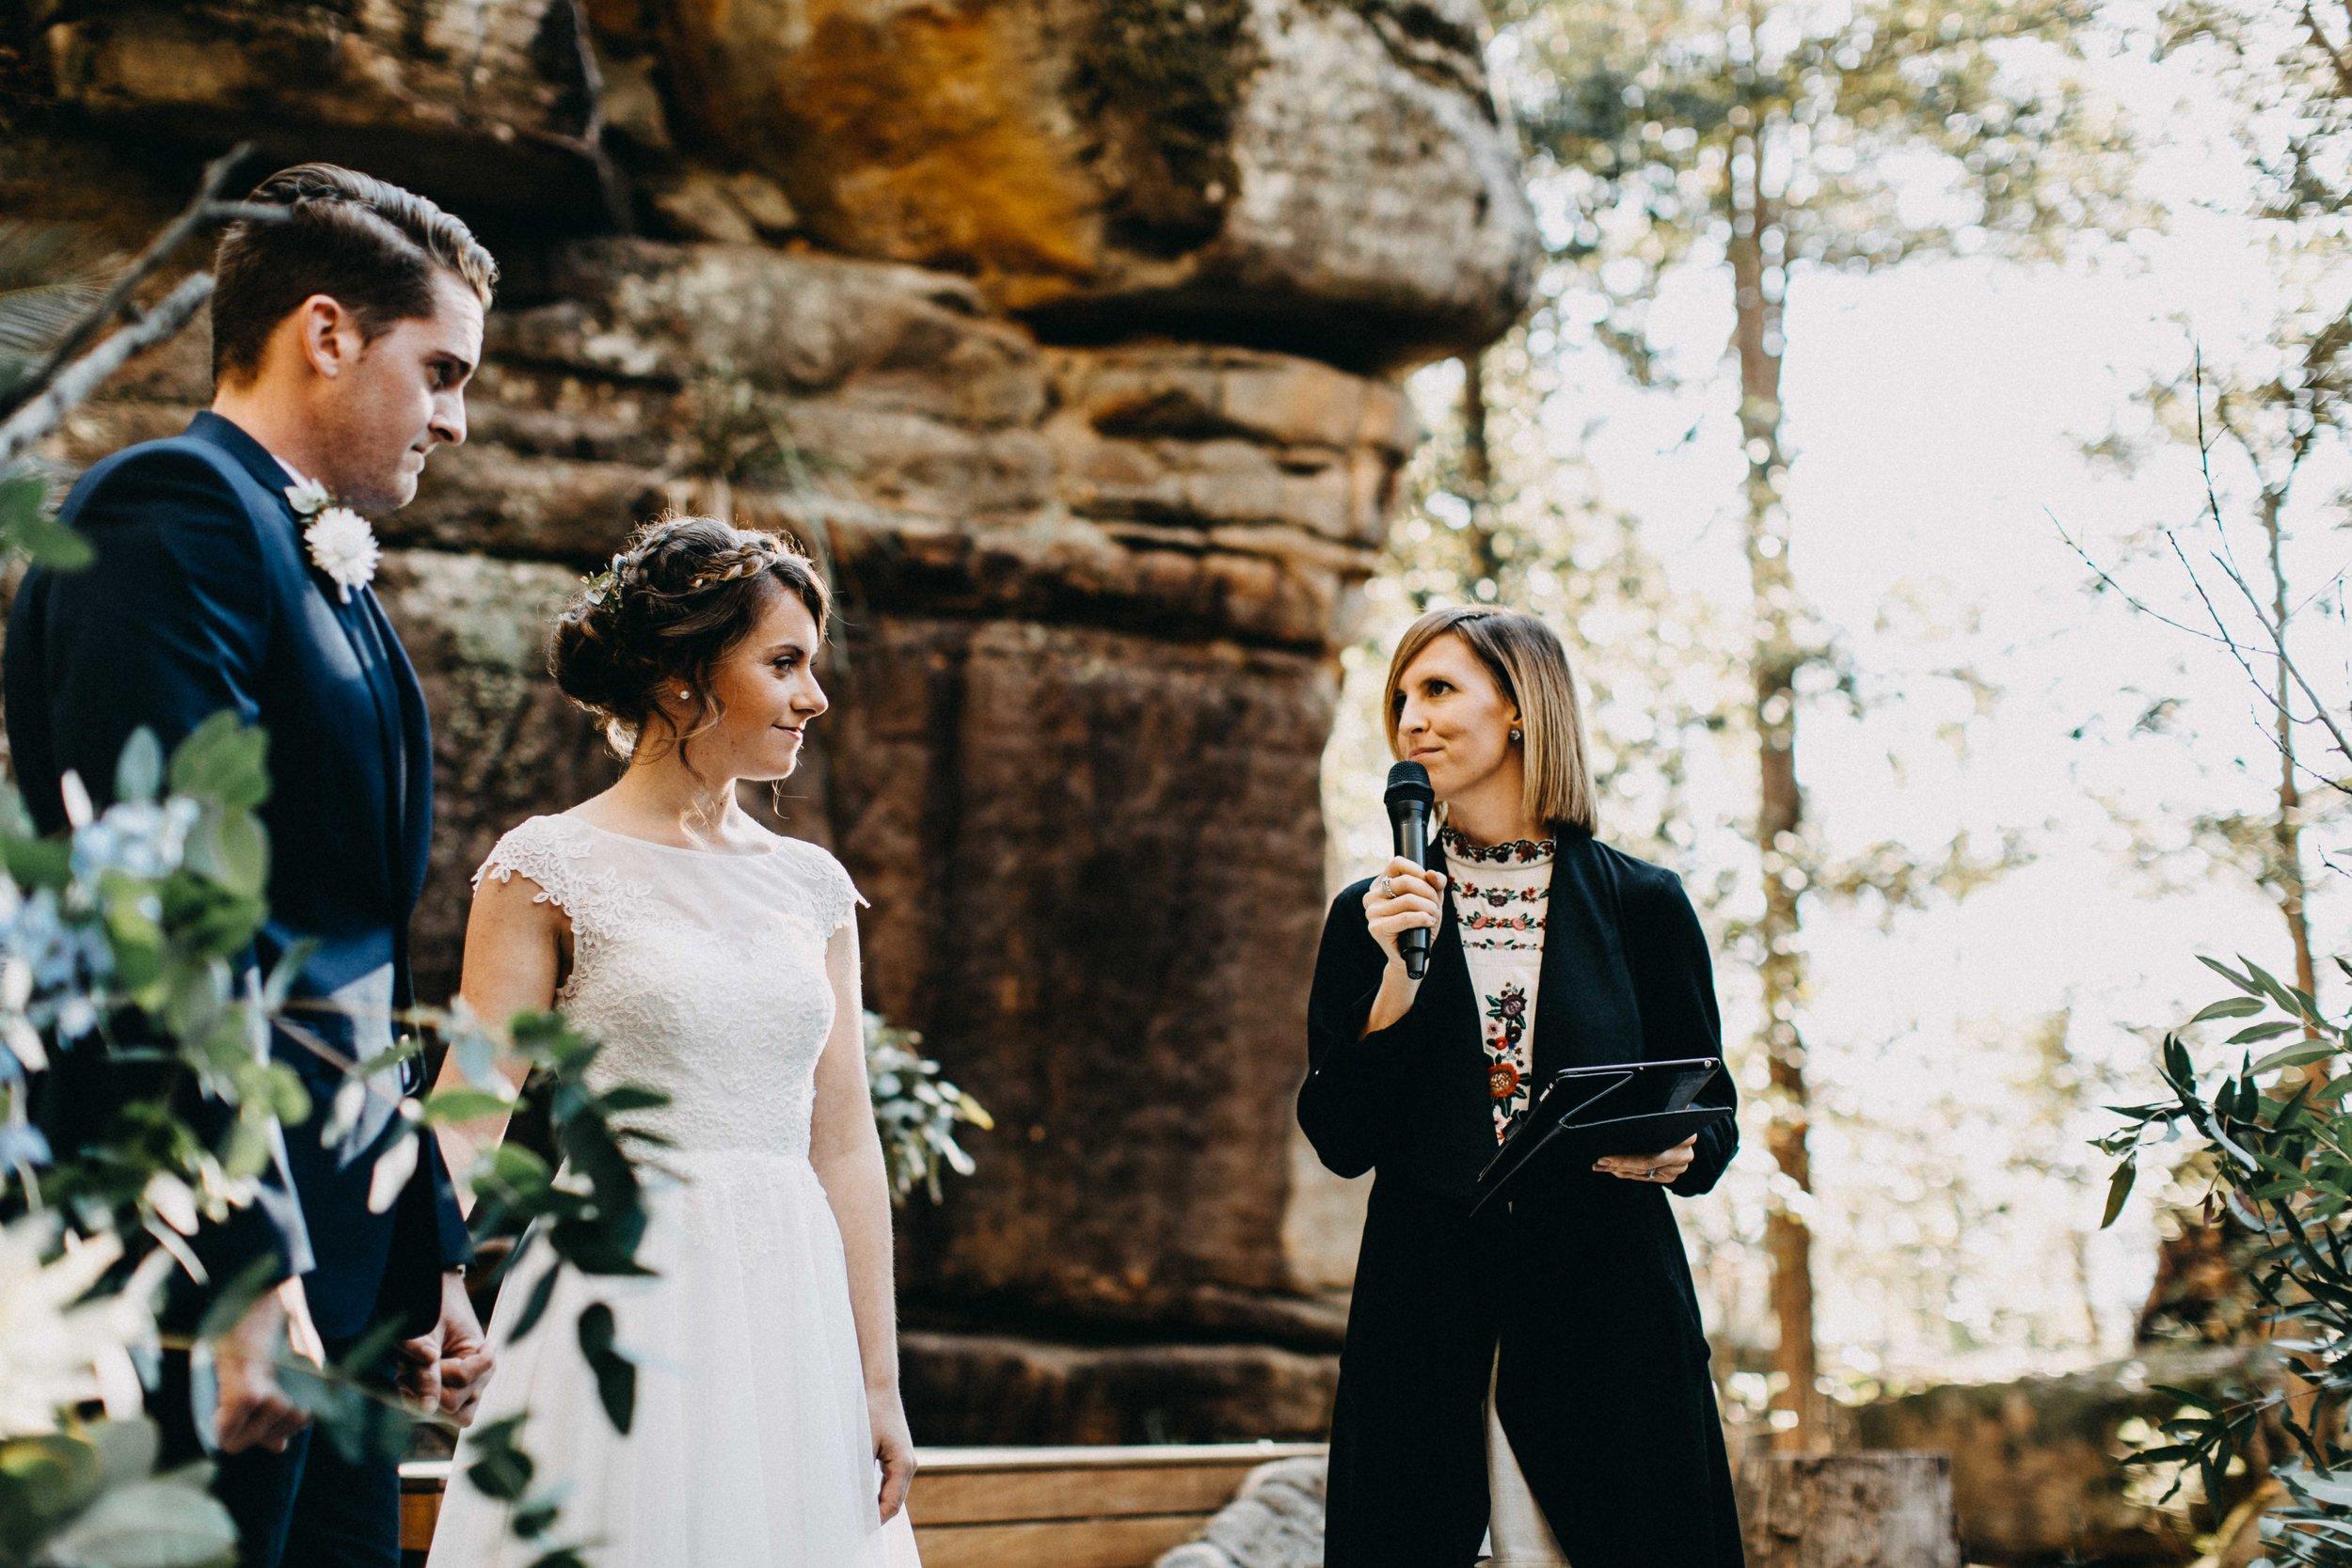 kangaroo-valley-bush-retreat-wedding-lydia-nate-www.emilyobrienphotography.net-58.jpg